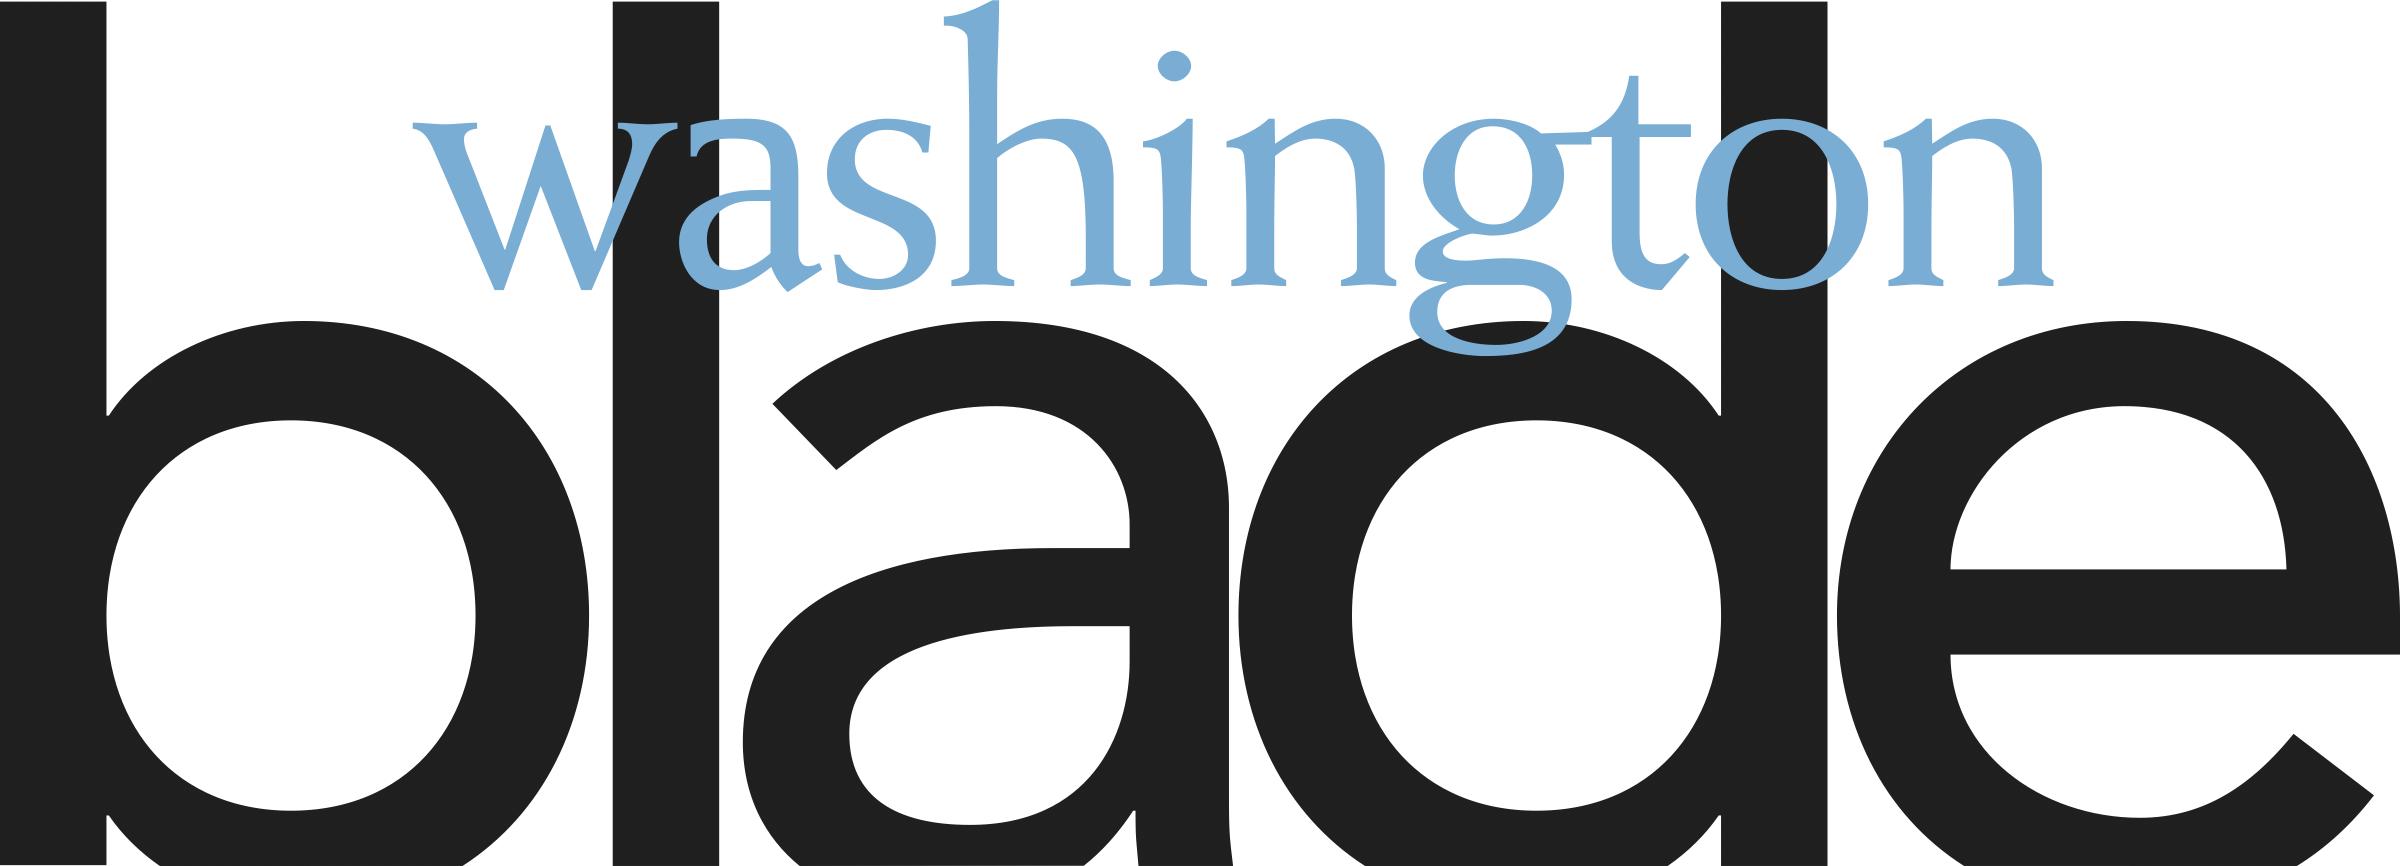 washington-blade-logo.jpg